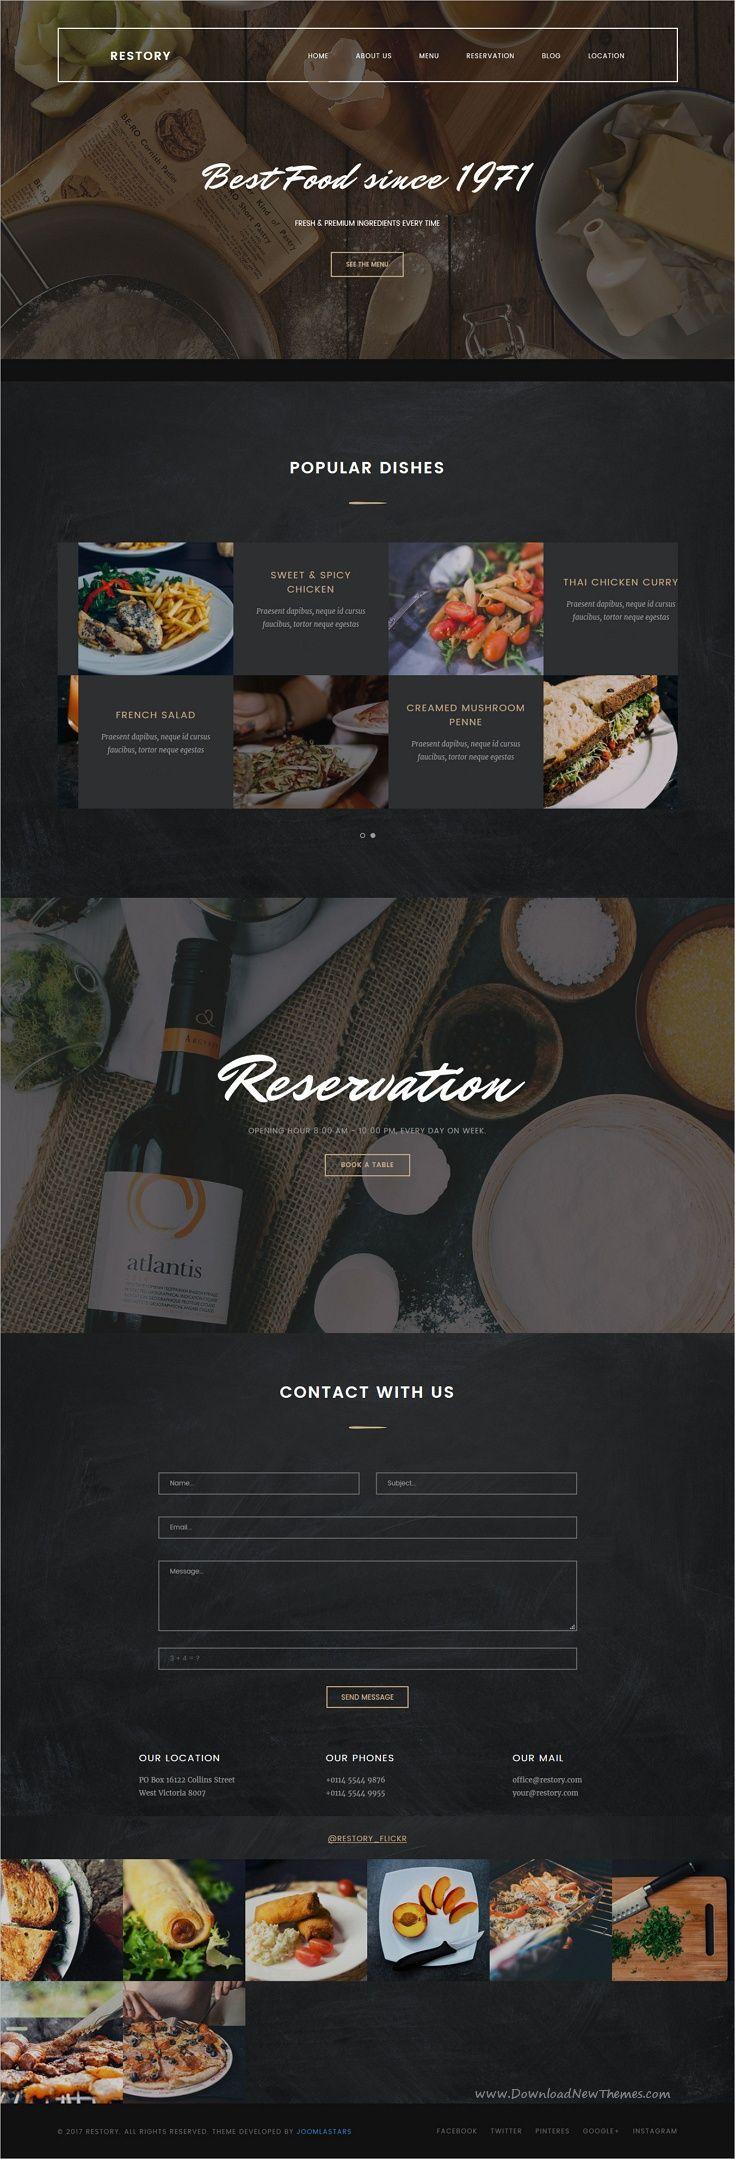 Restory is clean and modern design responsive Joomla